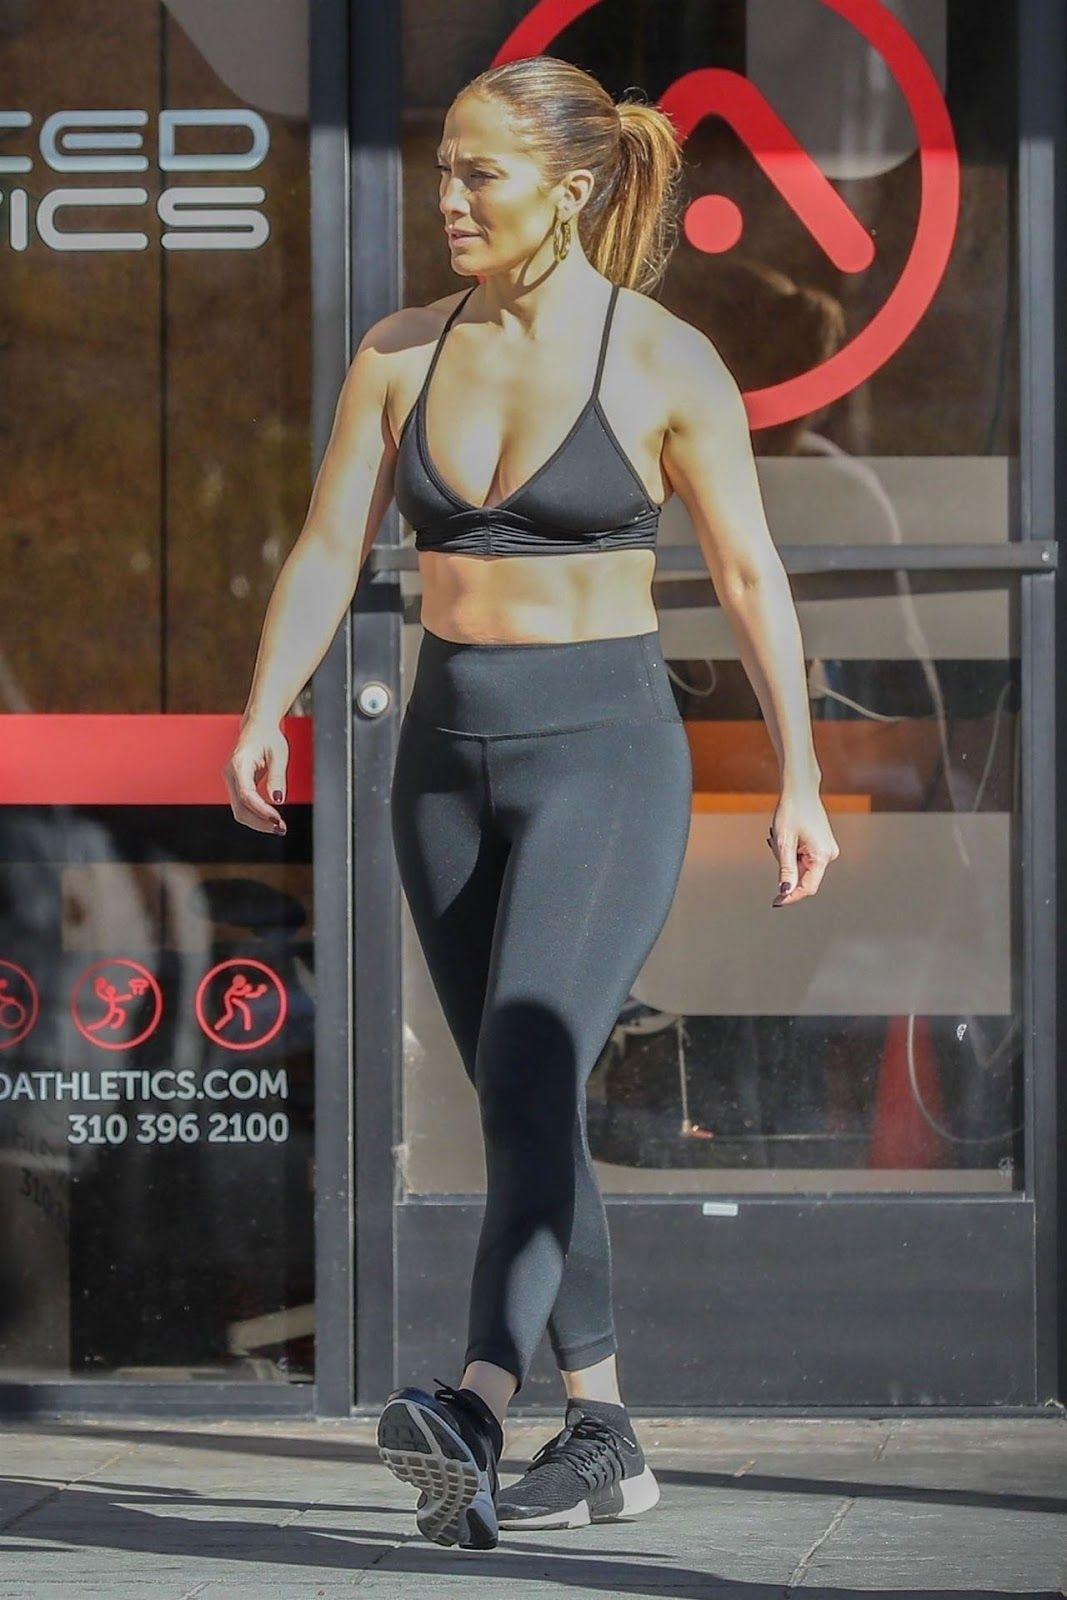 1c47ca25fdd97 Jennifer Lopez Booty at a Gym in Venice Beach 01 01 2019